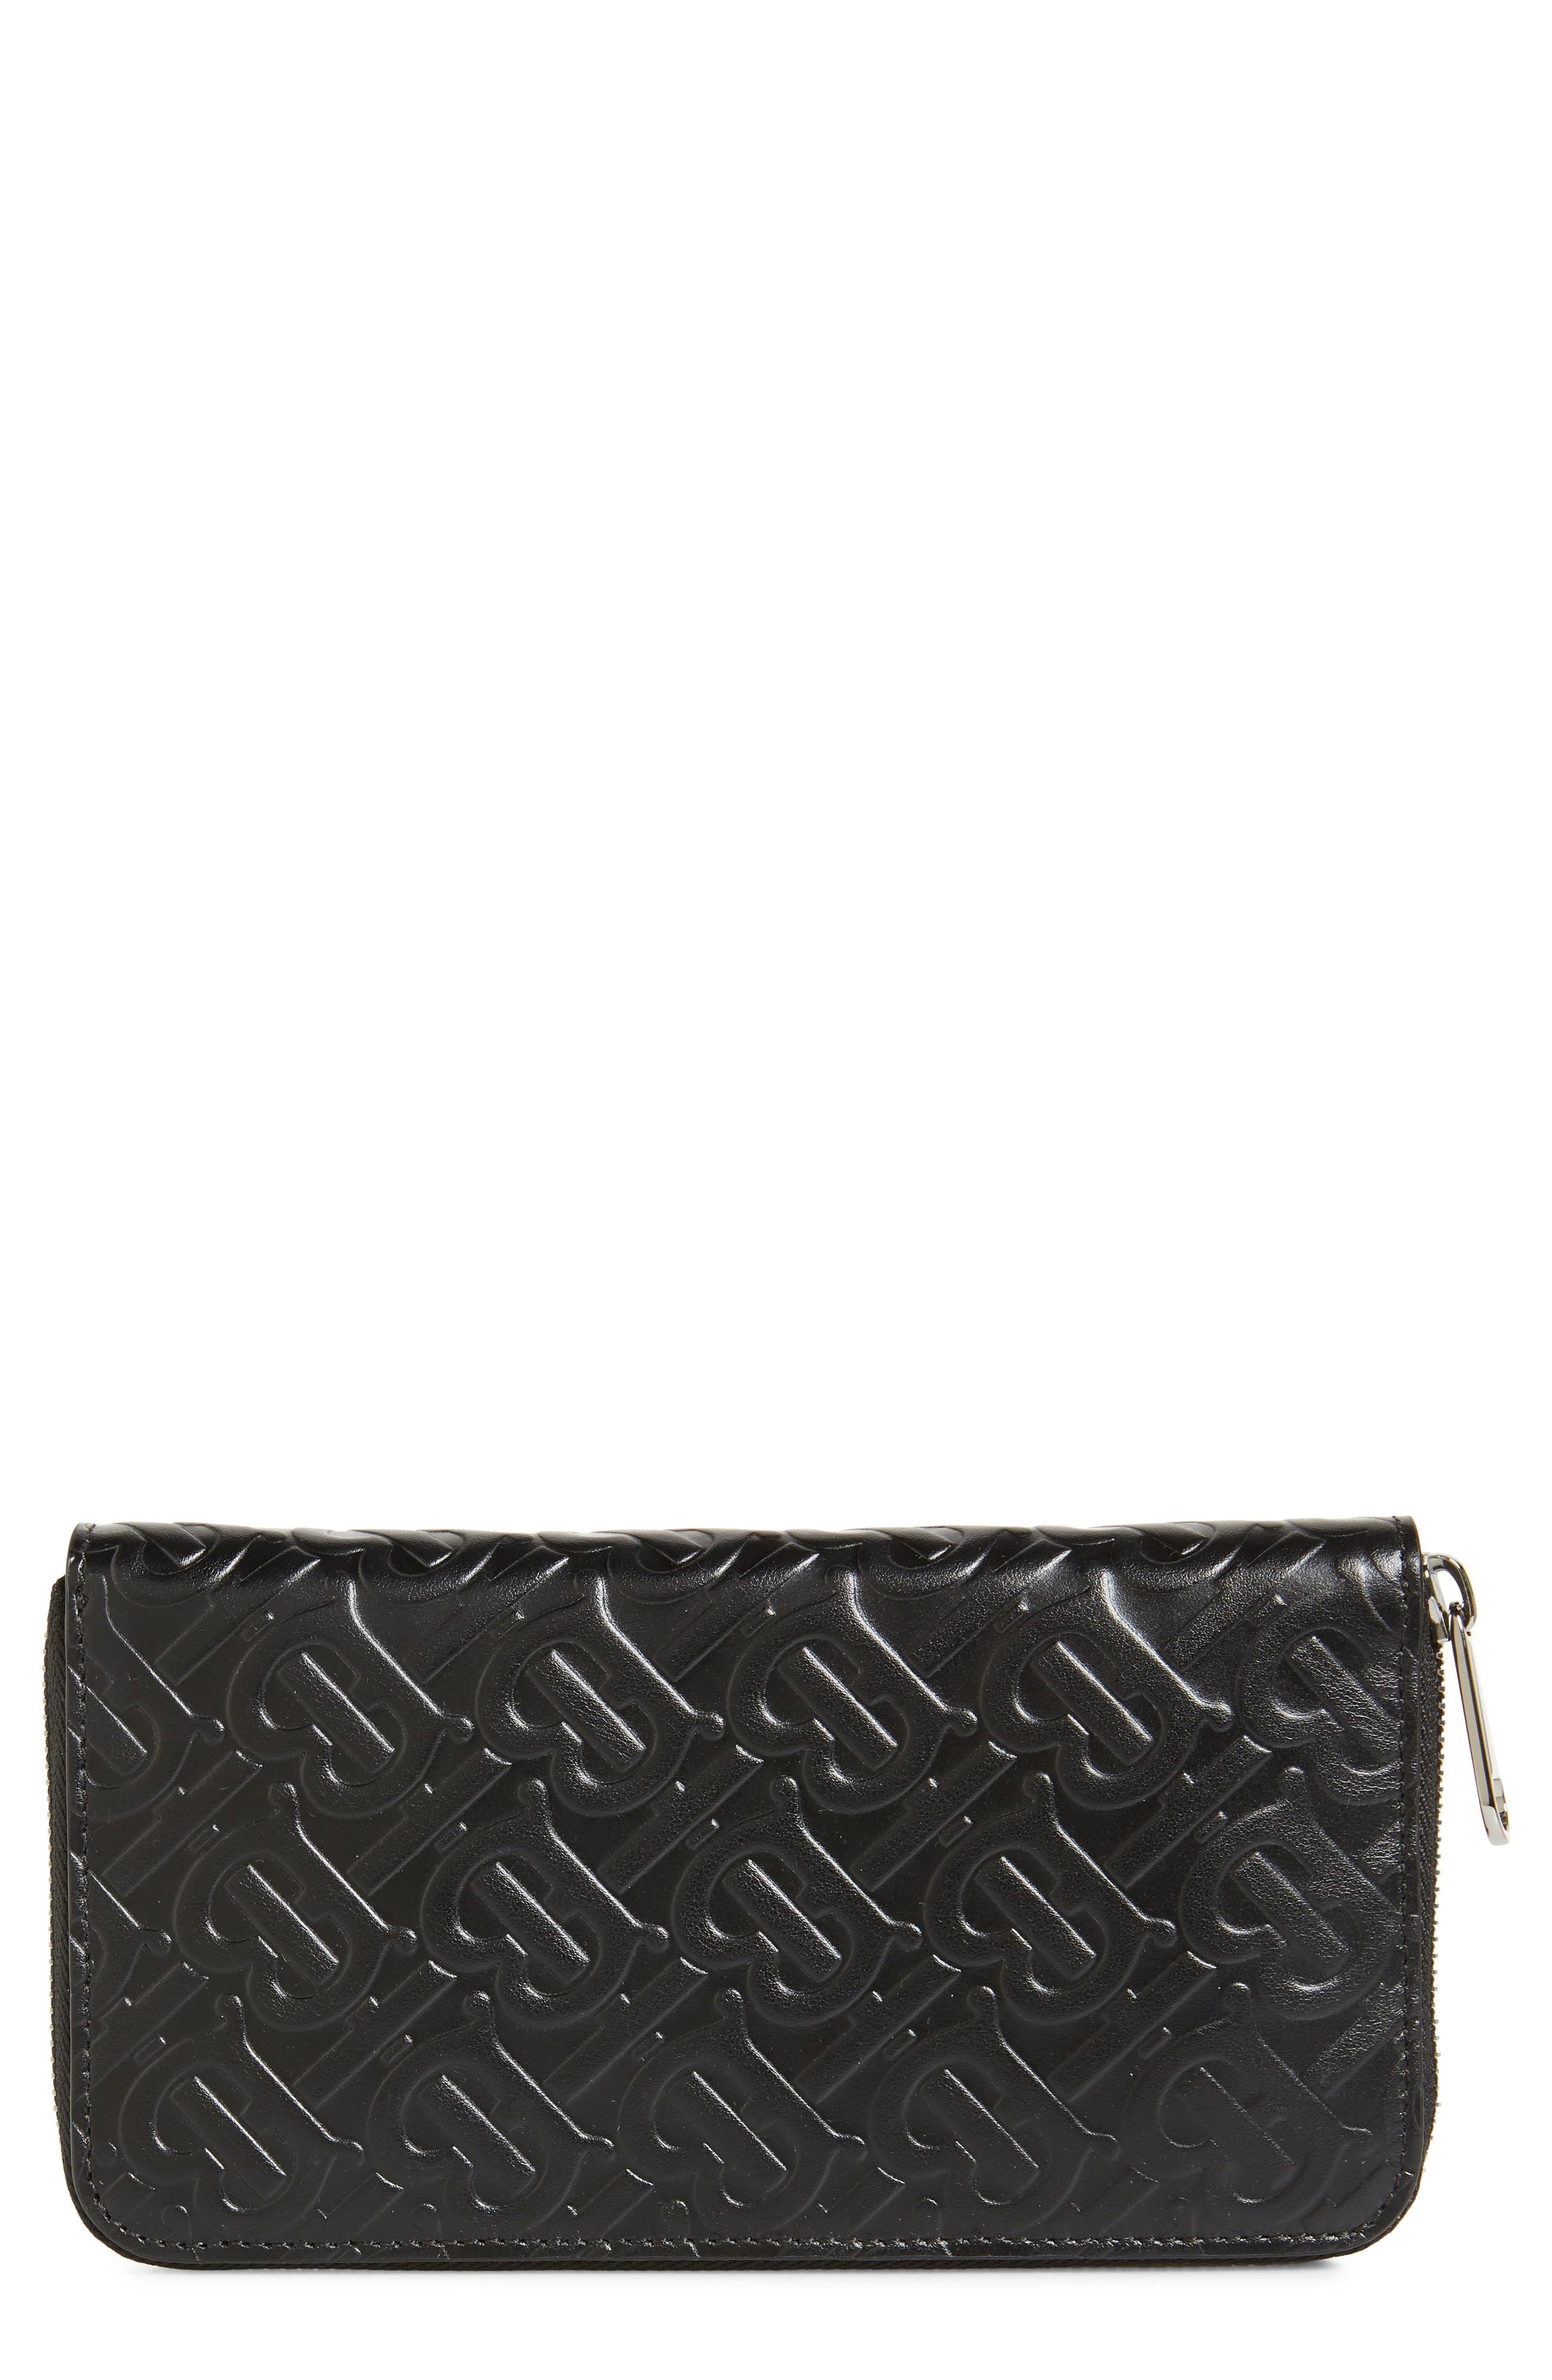 BURBERRY, Large Monogram Leather Wallet, Main thumbnail 1, color, BLACK